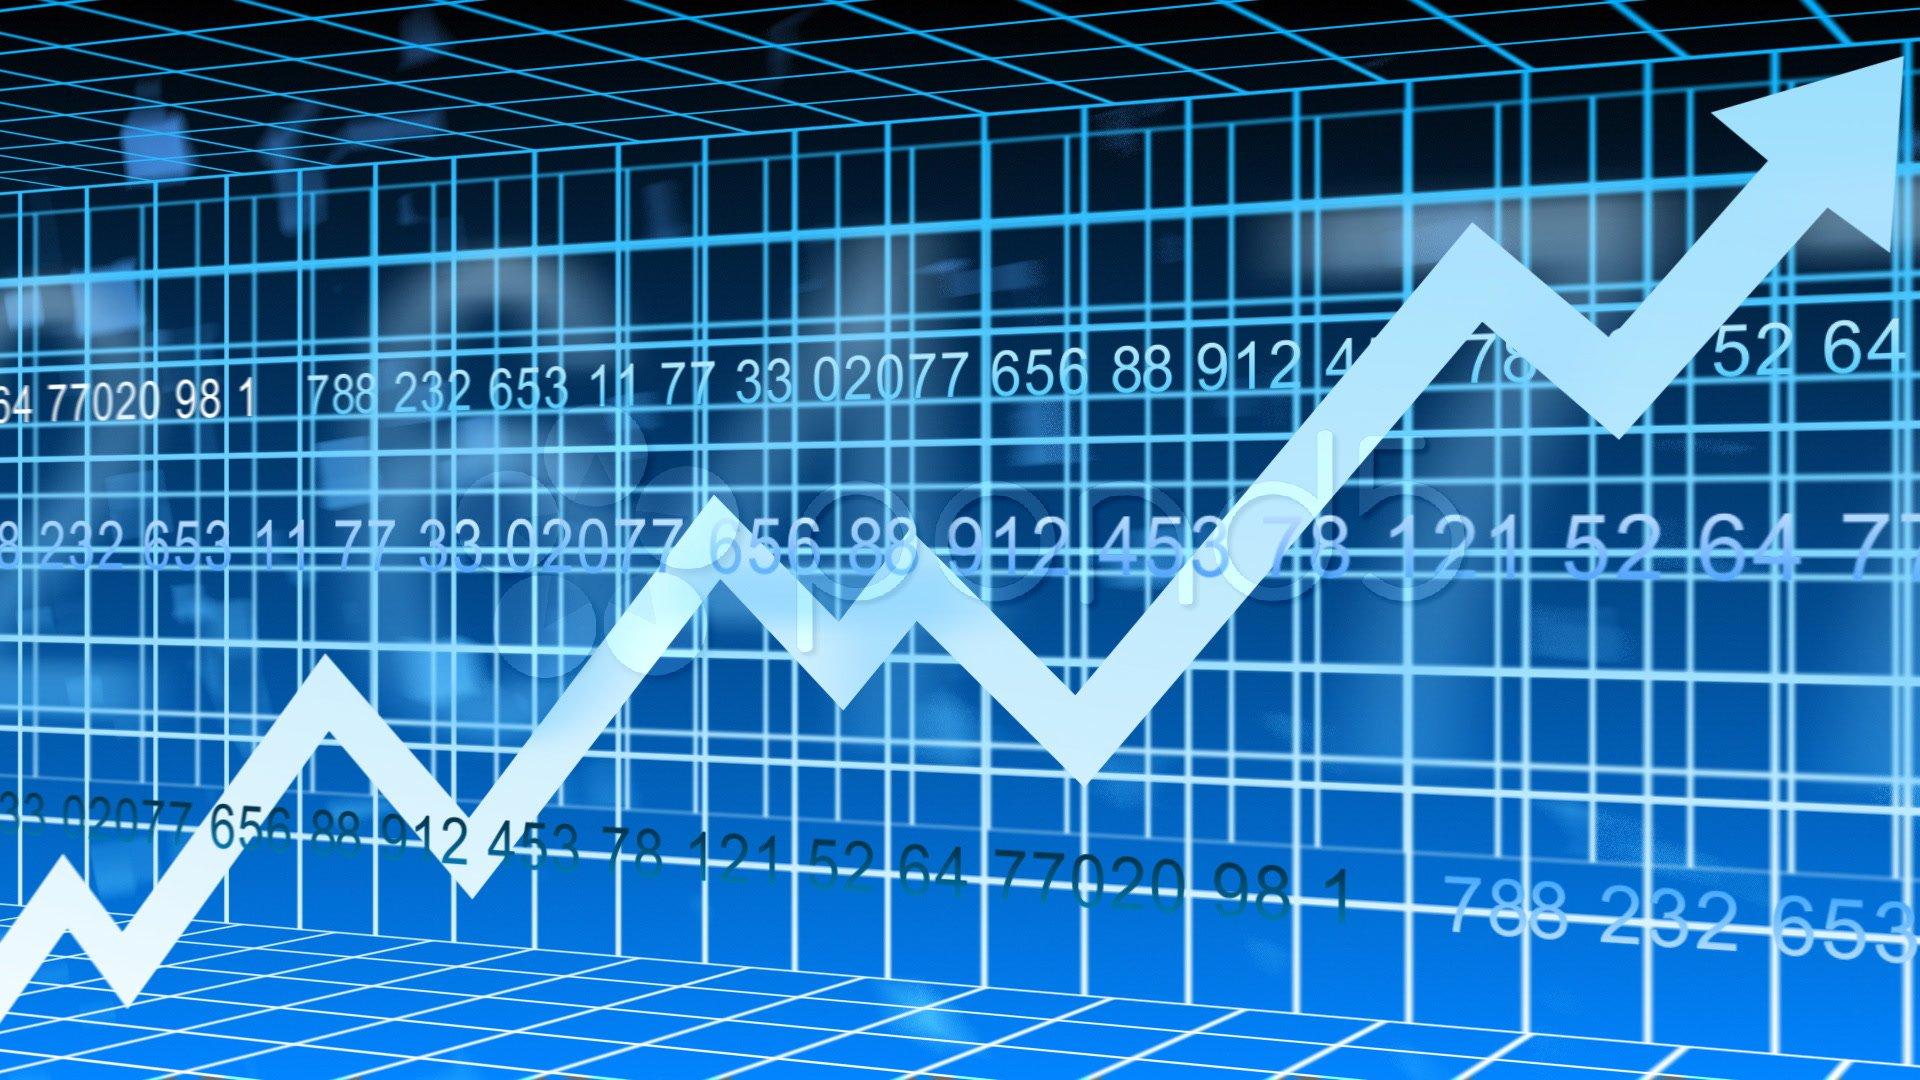 [86+] Stock Market Crash Wallpapers on WallpaperSafari